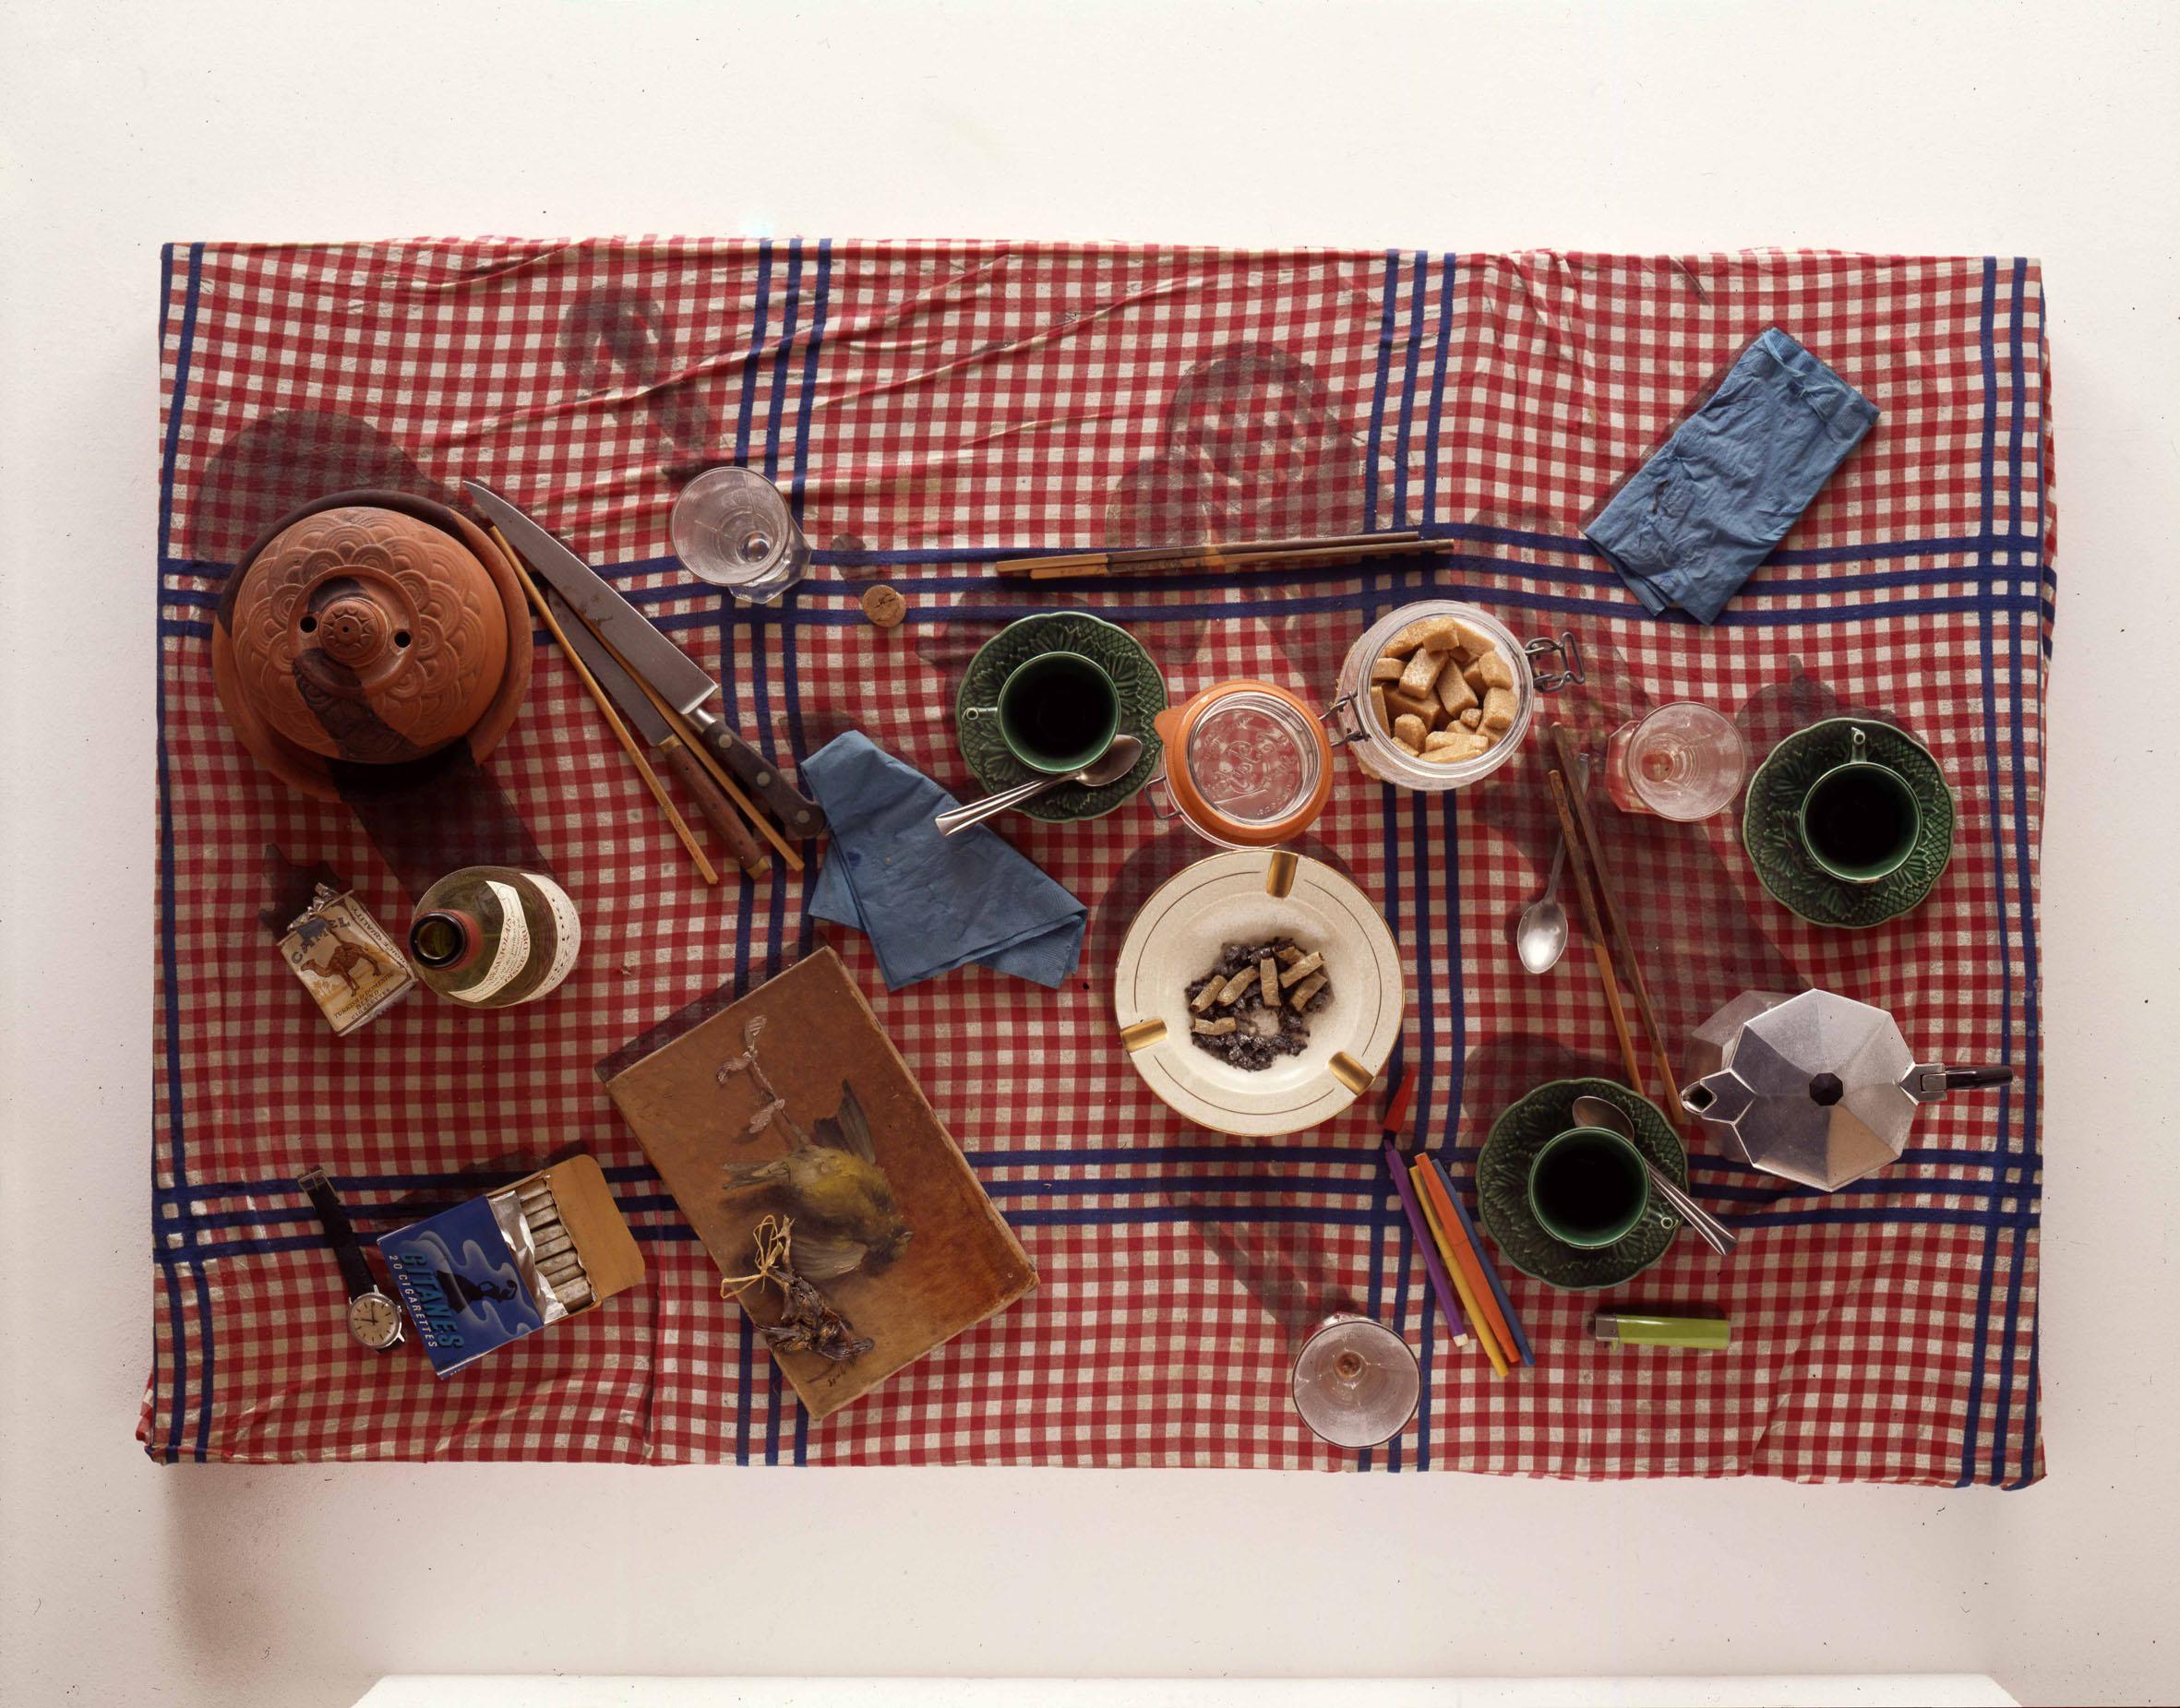 Pipilotti Rist, production ART for The World, Genève